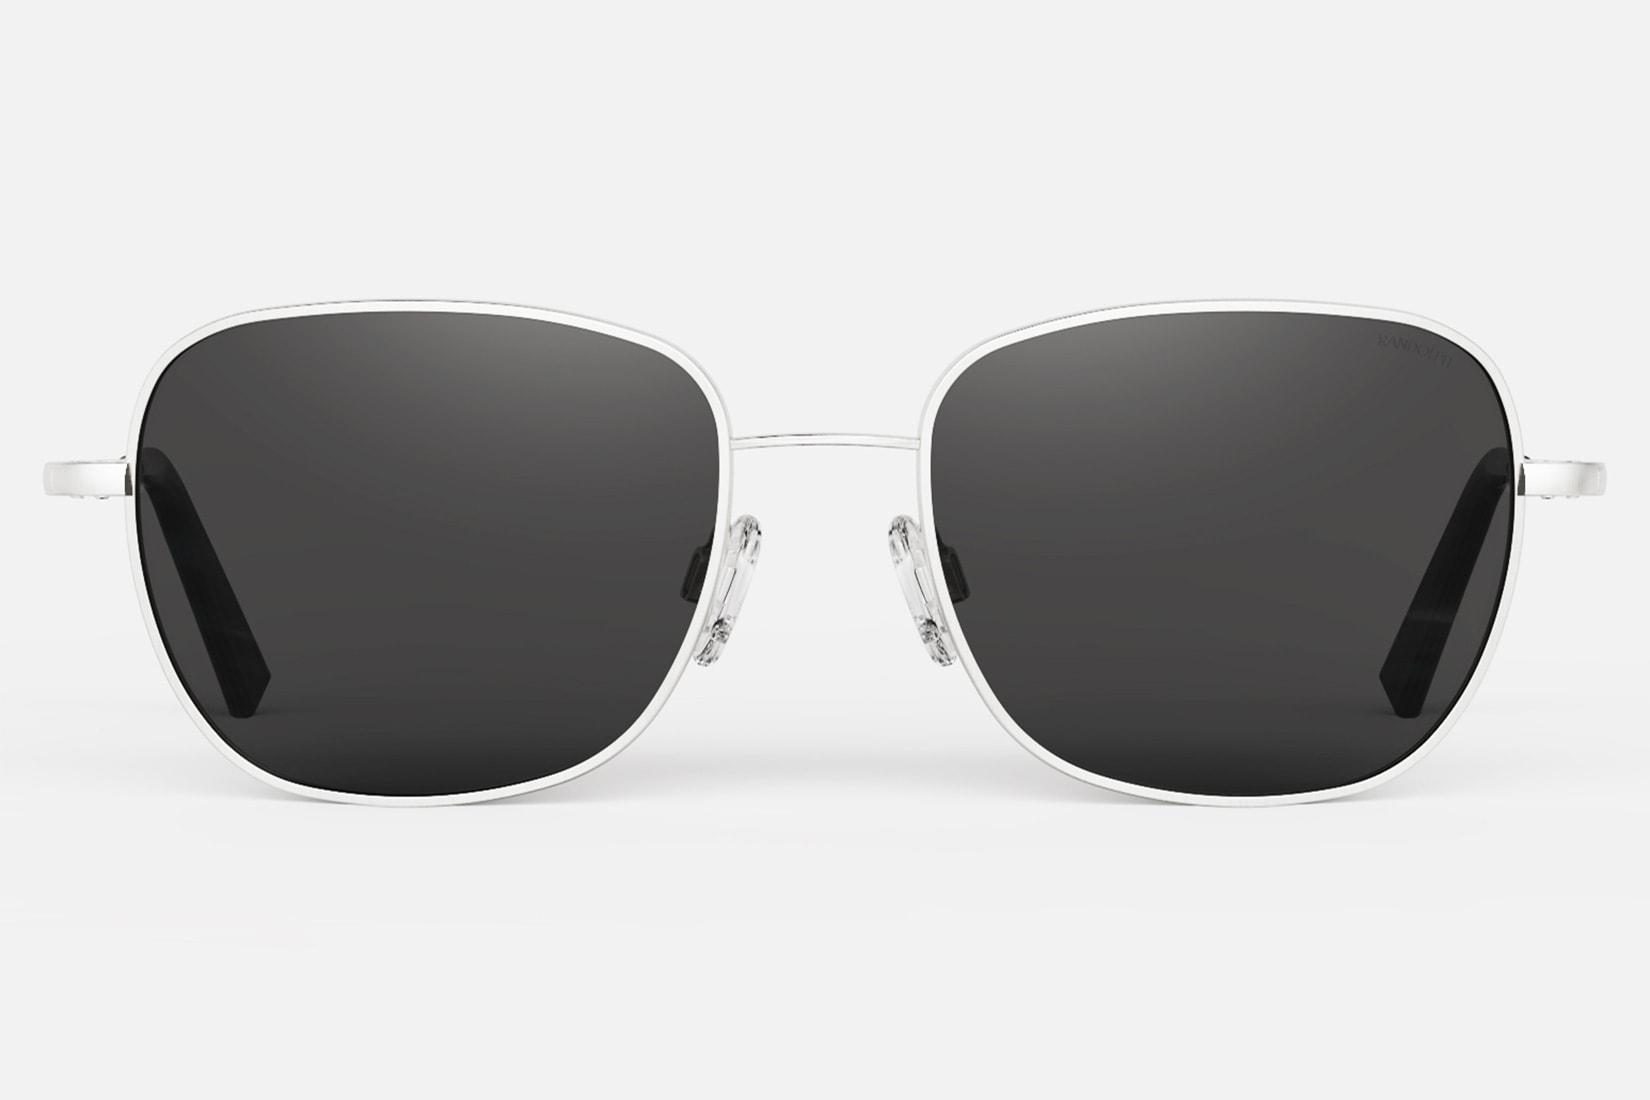 Randolph USA cecil women sunglasses review - Luxe Digital